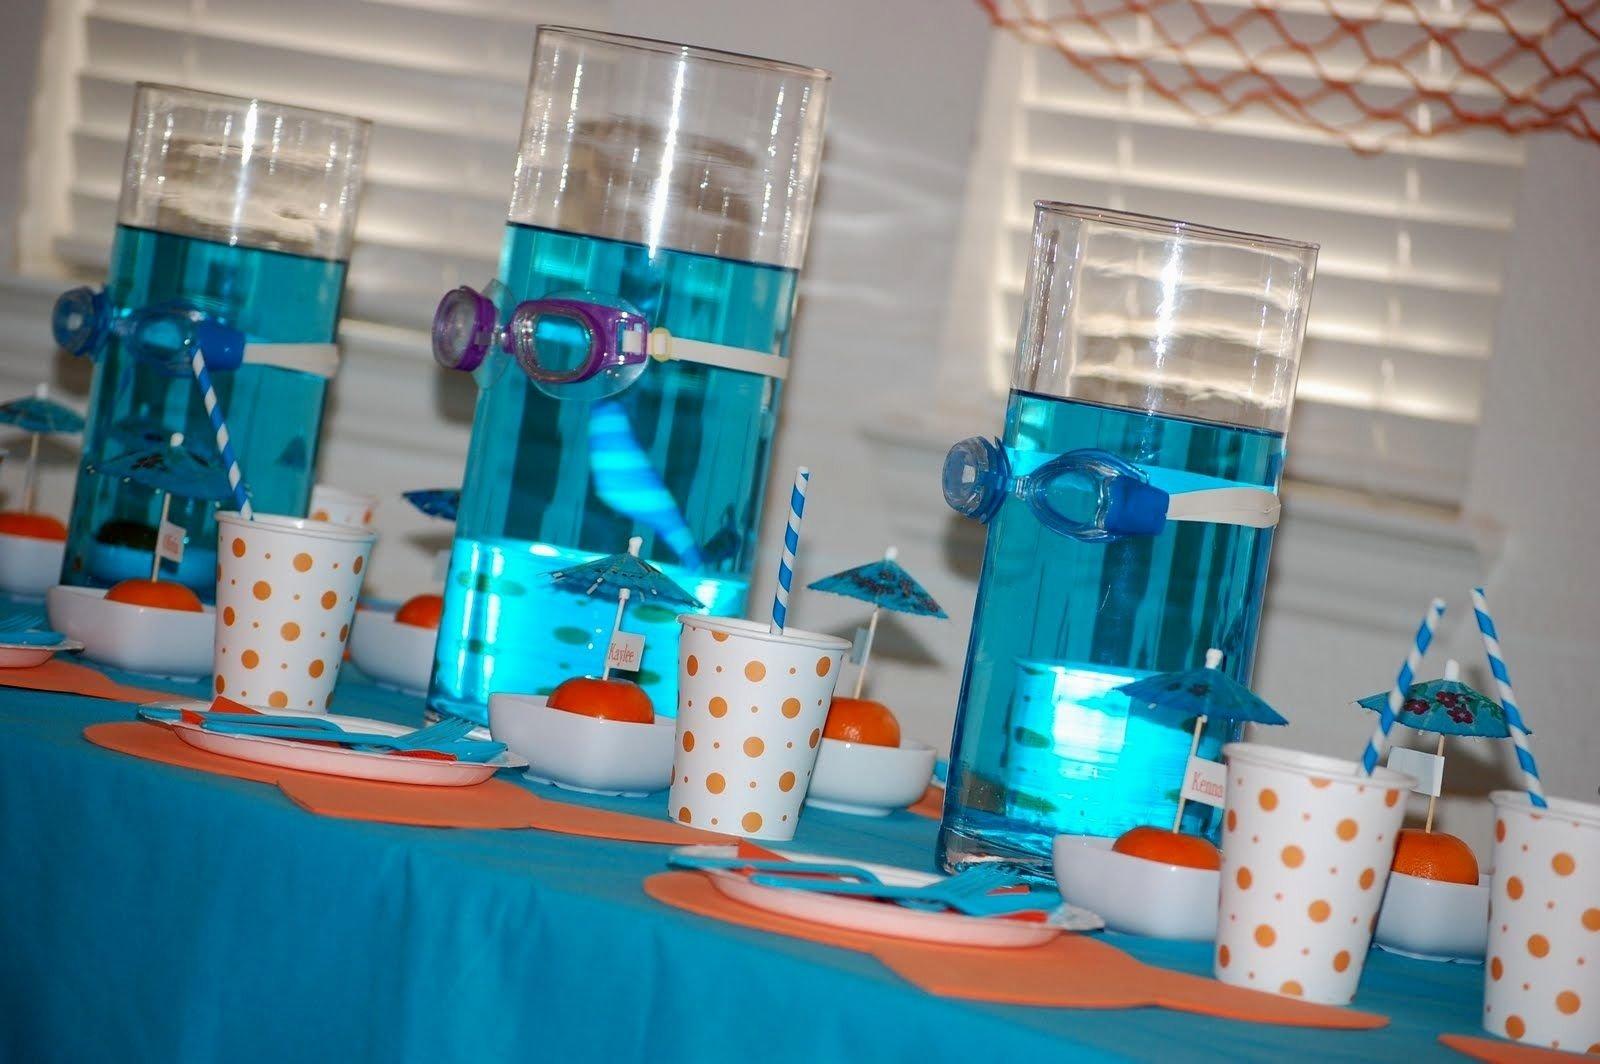 10 Fabulous Under The Sea Party Decoration Ideas under the sea party decoration ideas decorating decor home design 35 2021